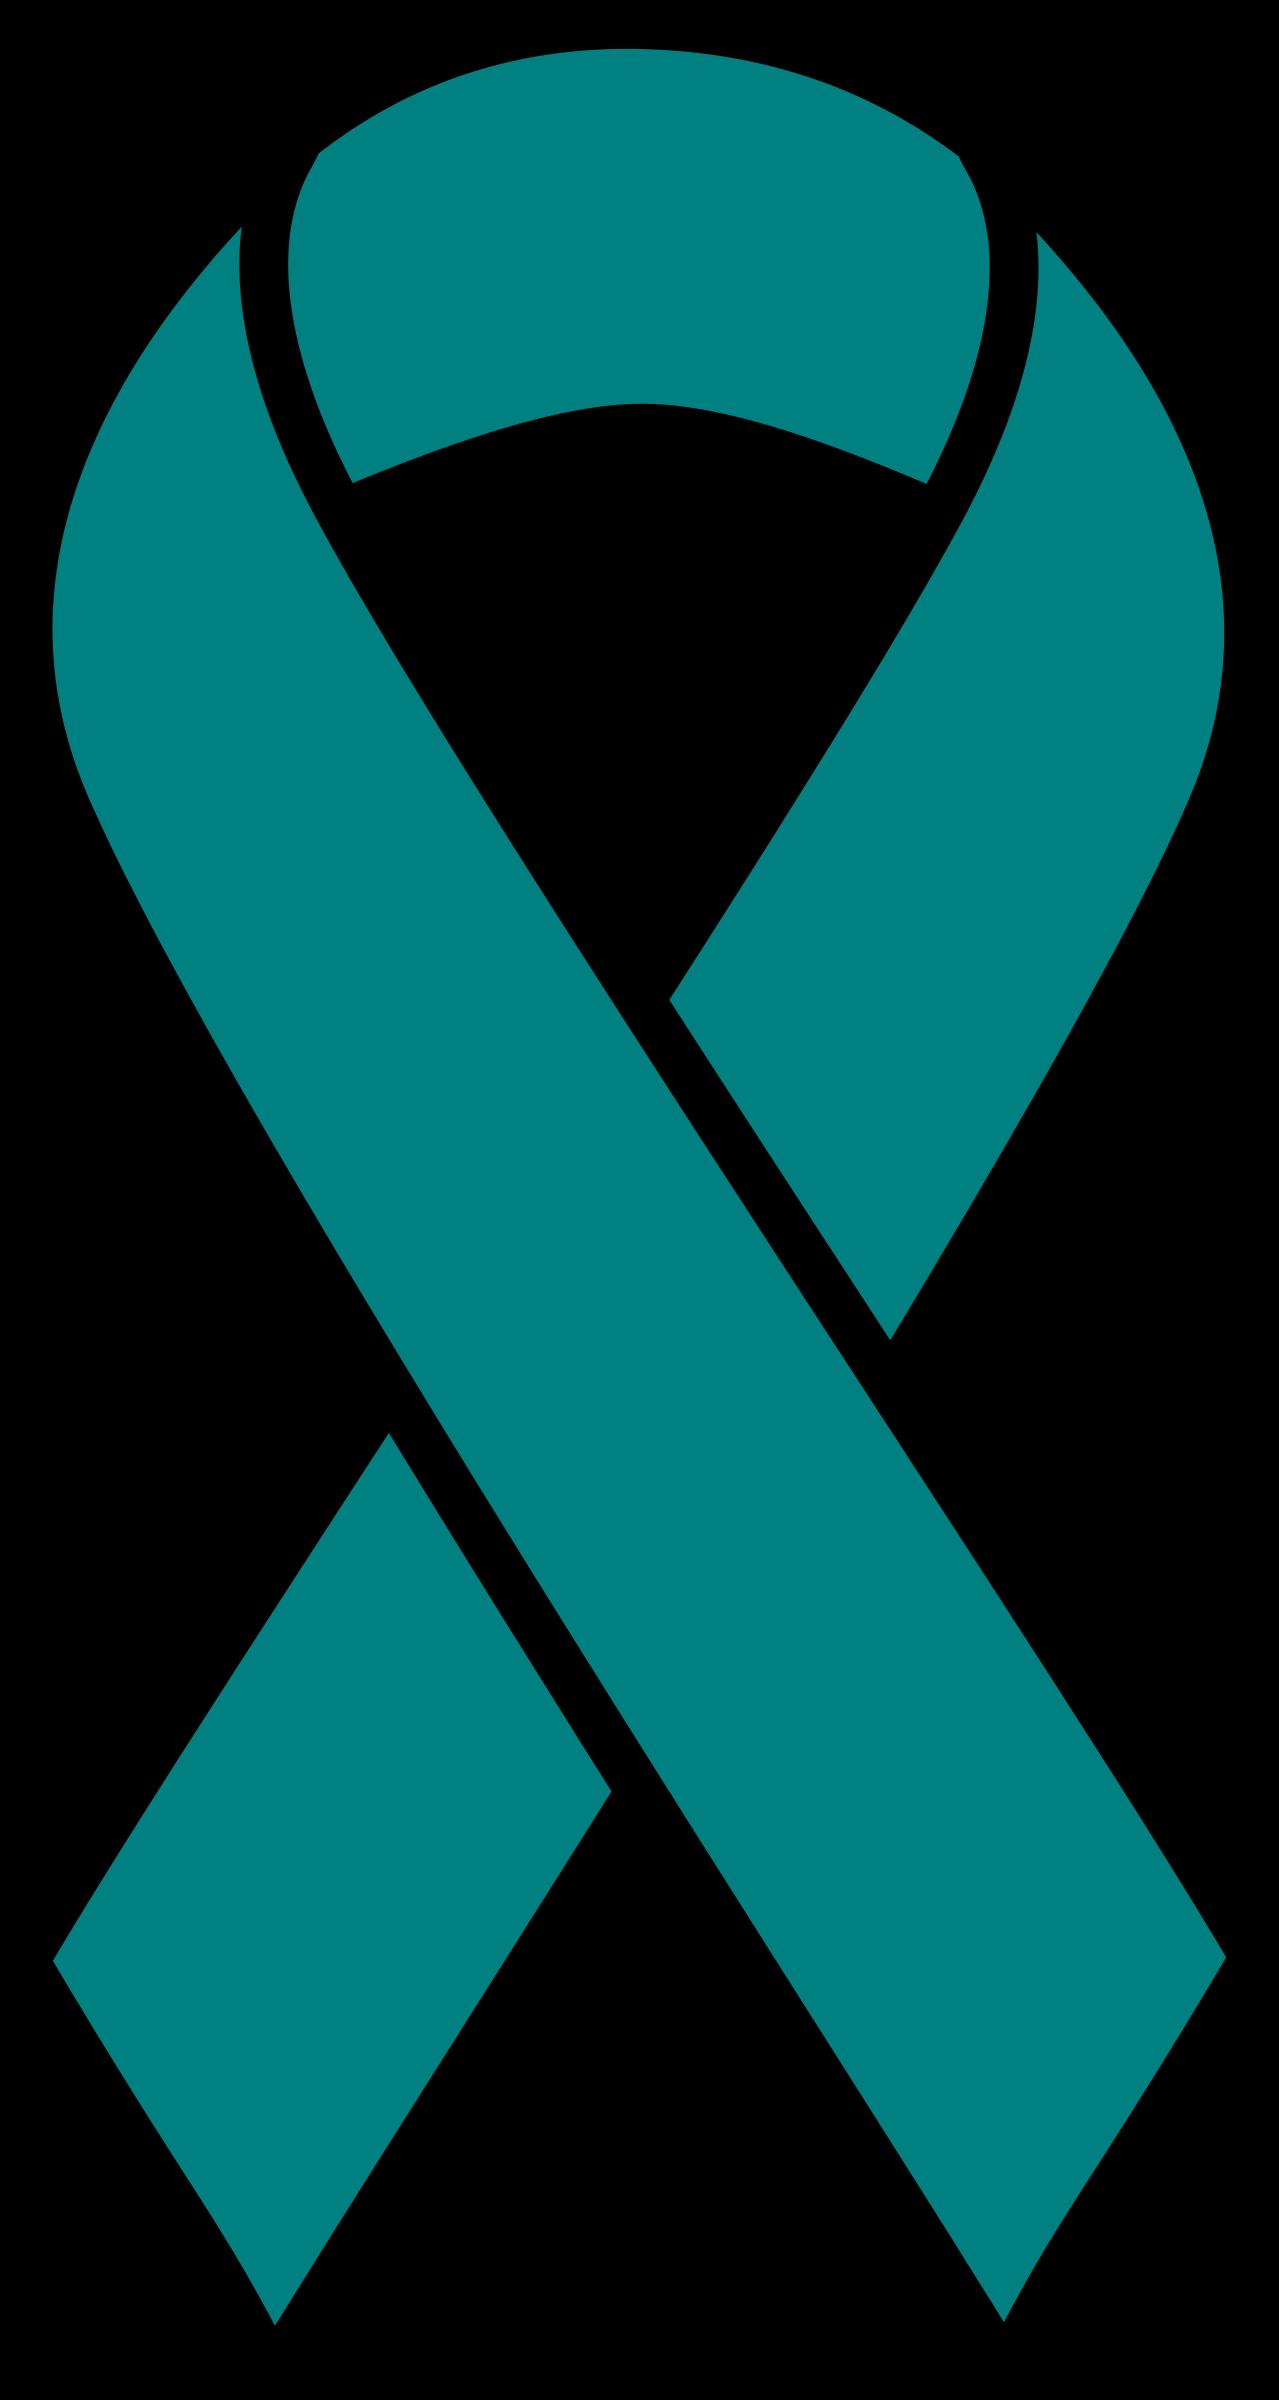 Cancer ribbon heart clipart image stock Clipart - Teal Ovarian Cancer Ribbon image stock